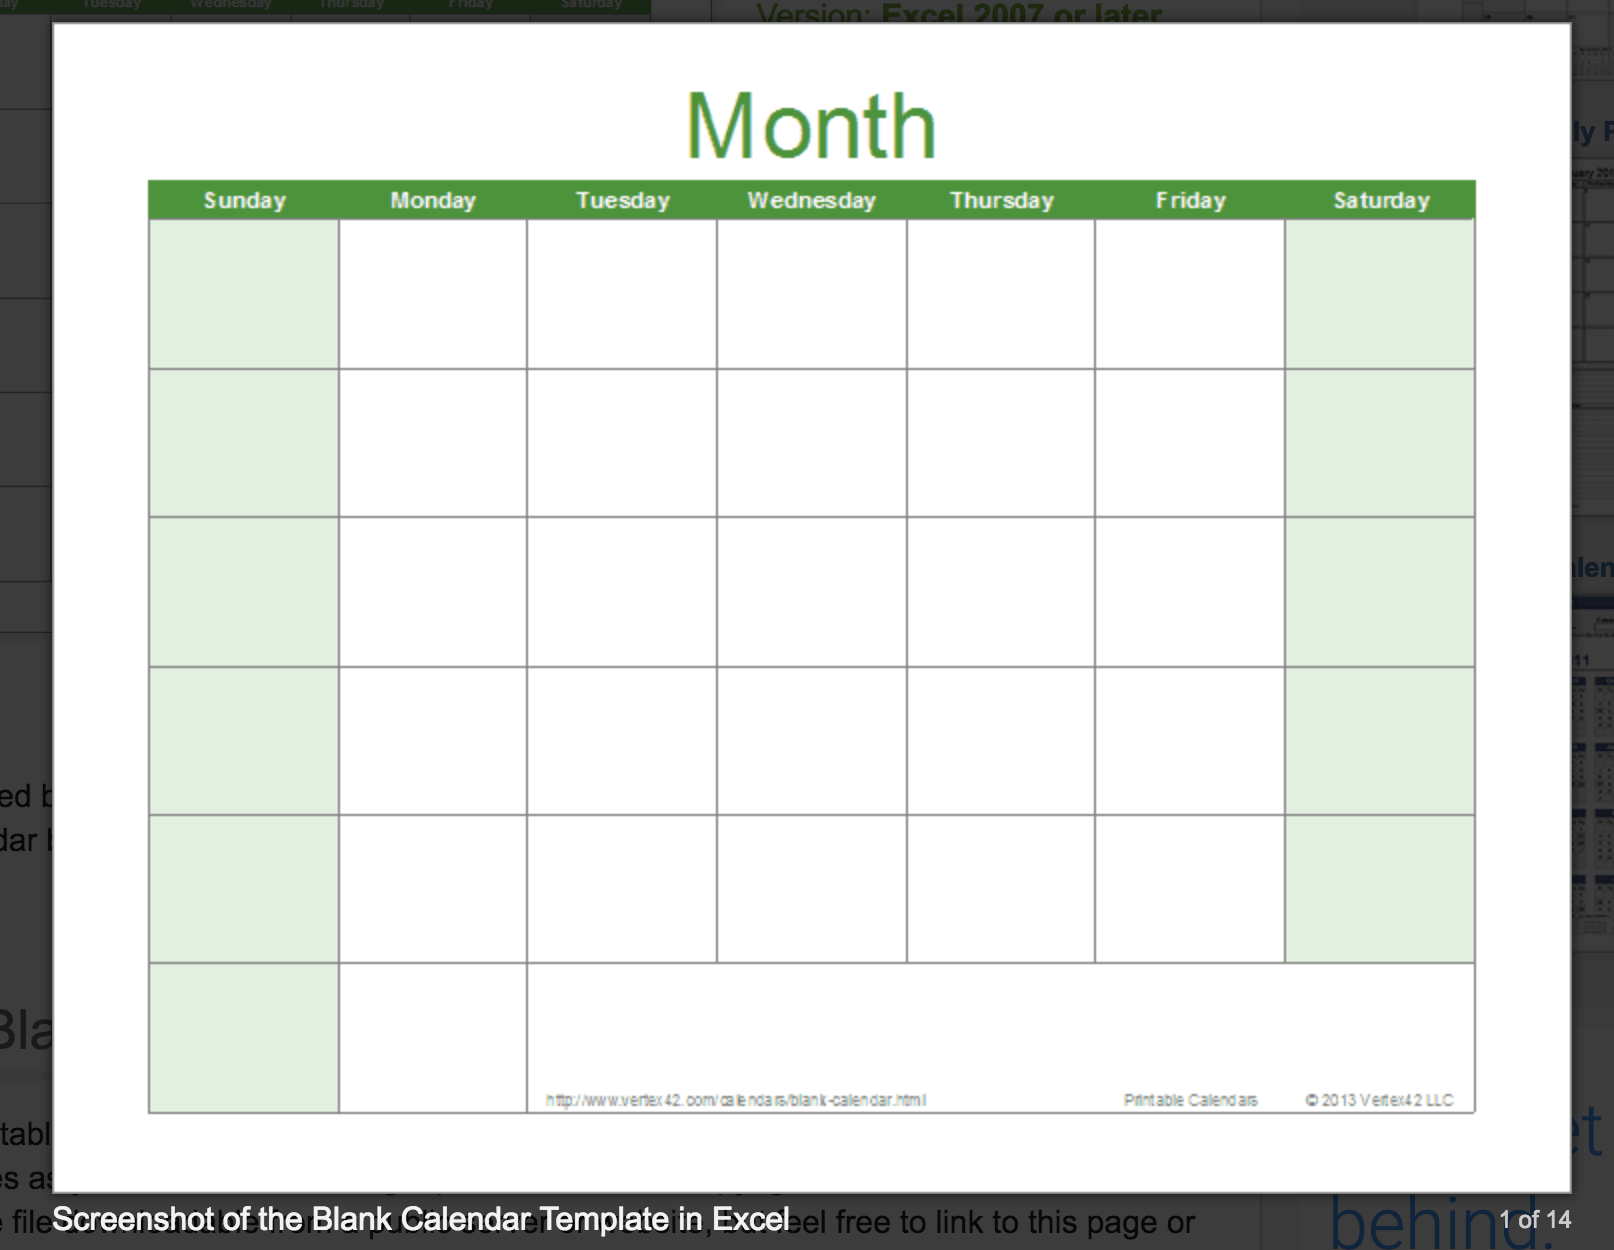 Calendar Template Mac - Wpa.wpart.co